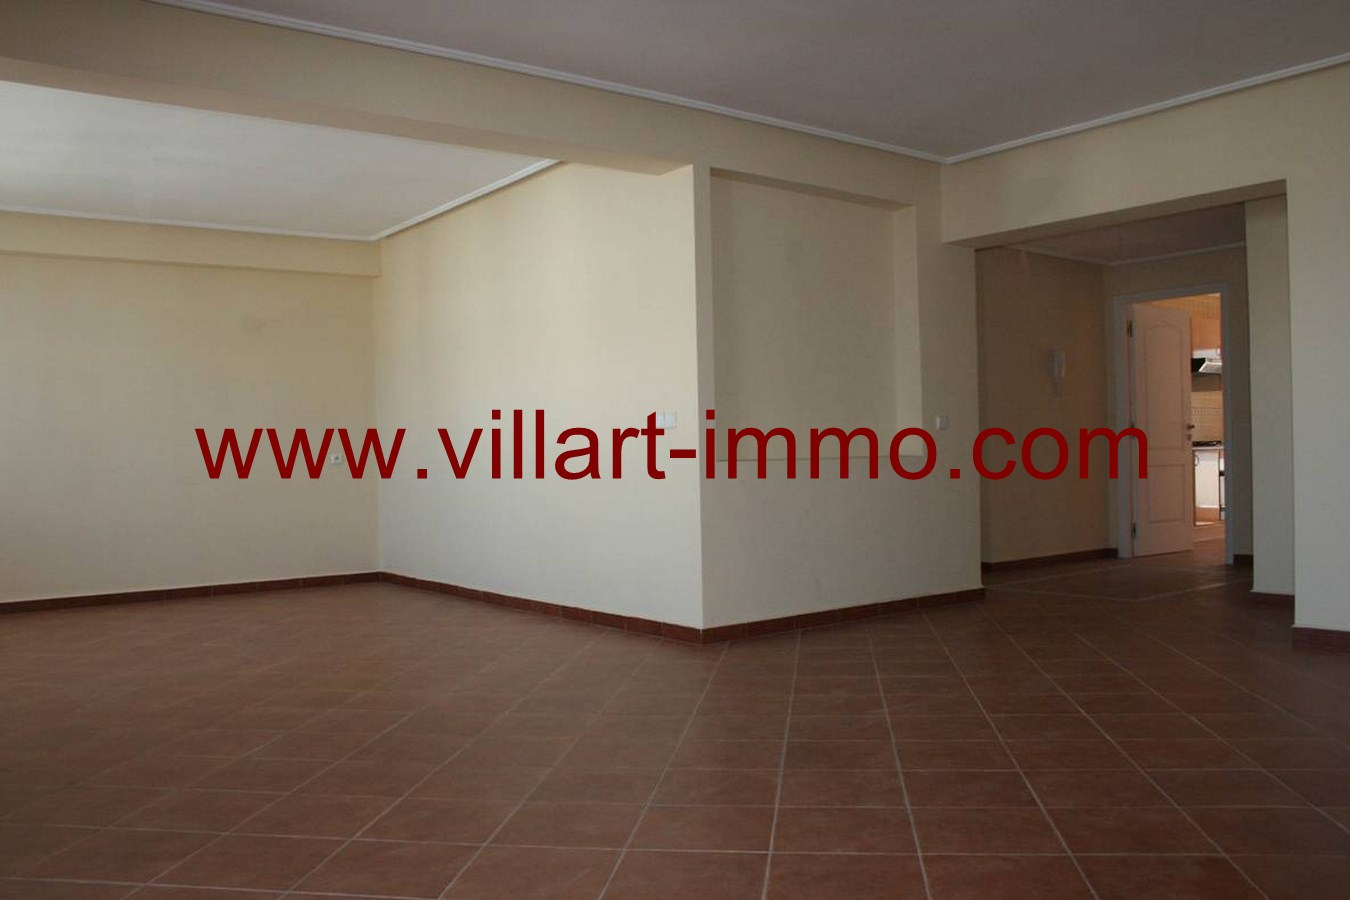 2-vente-appartement-tanger-malabata-salon-2-va453-villart-immo